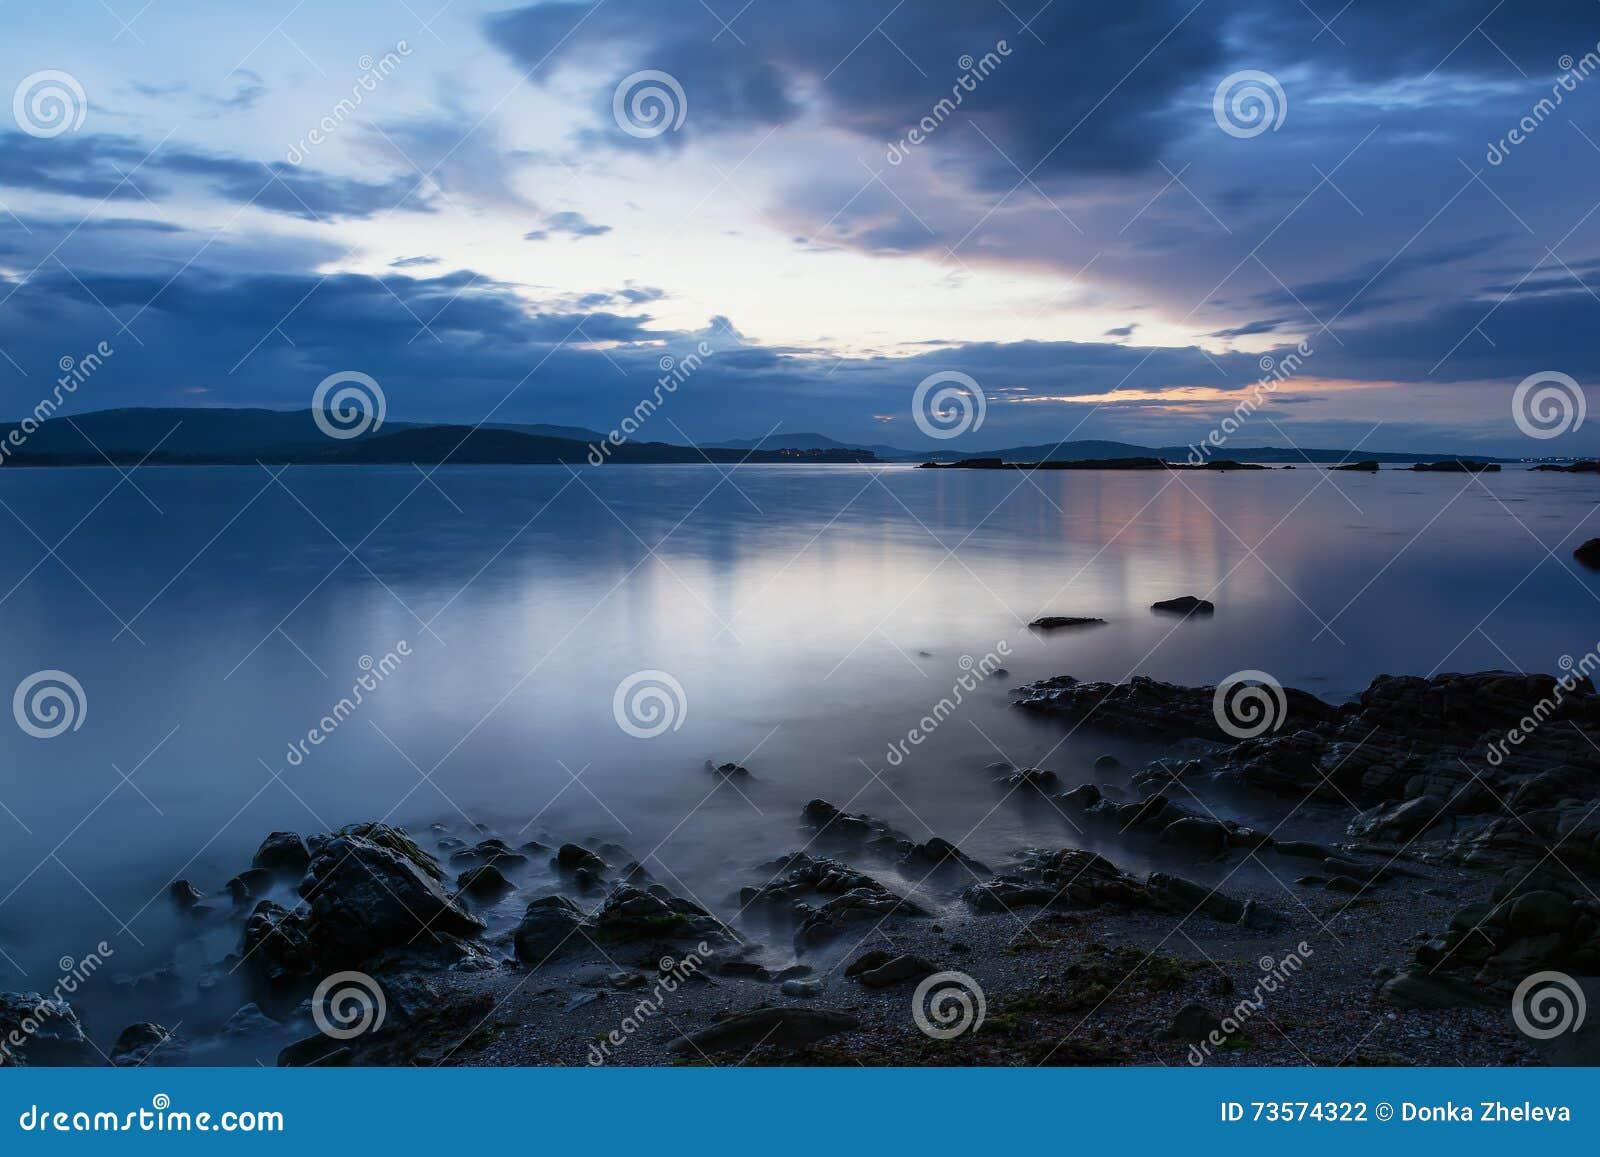 Sonnenuntergang in der blauen Stunde, Küste Schwarzen Meers, Bulgarien